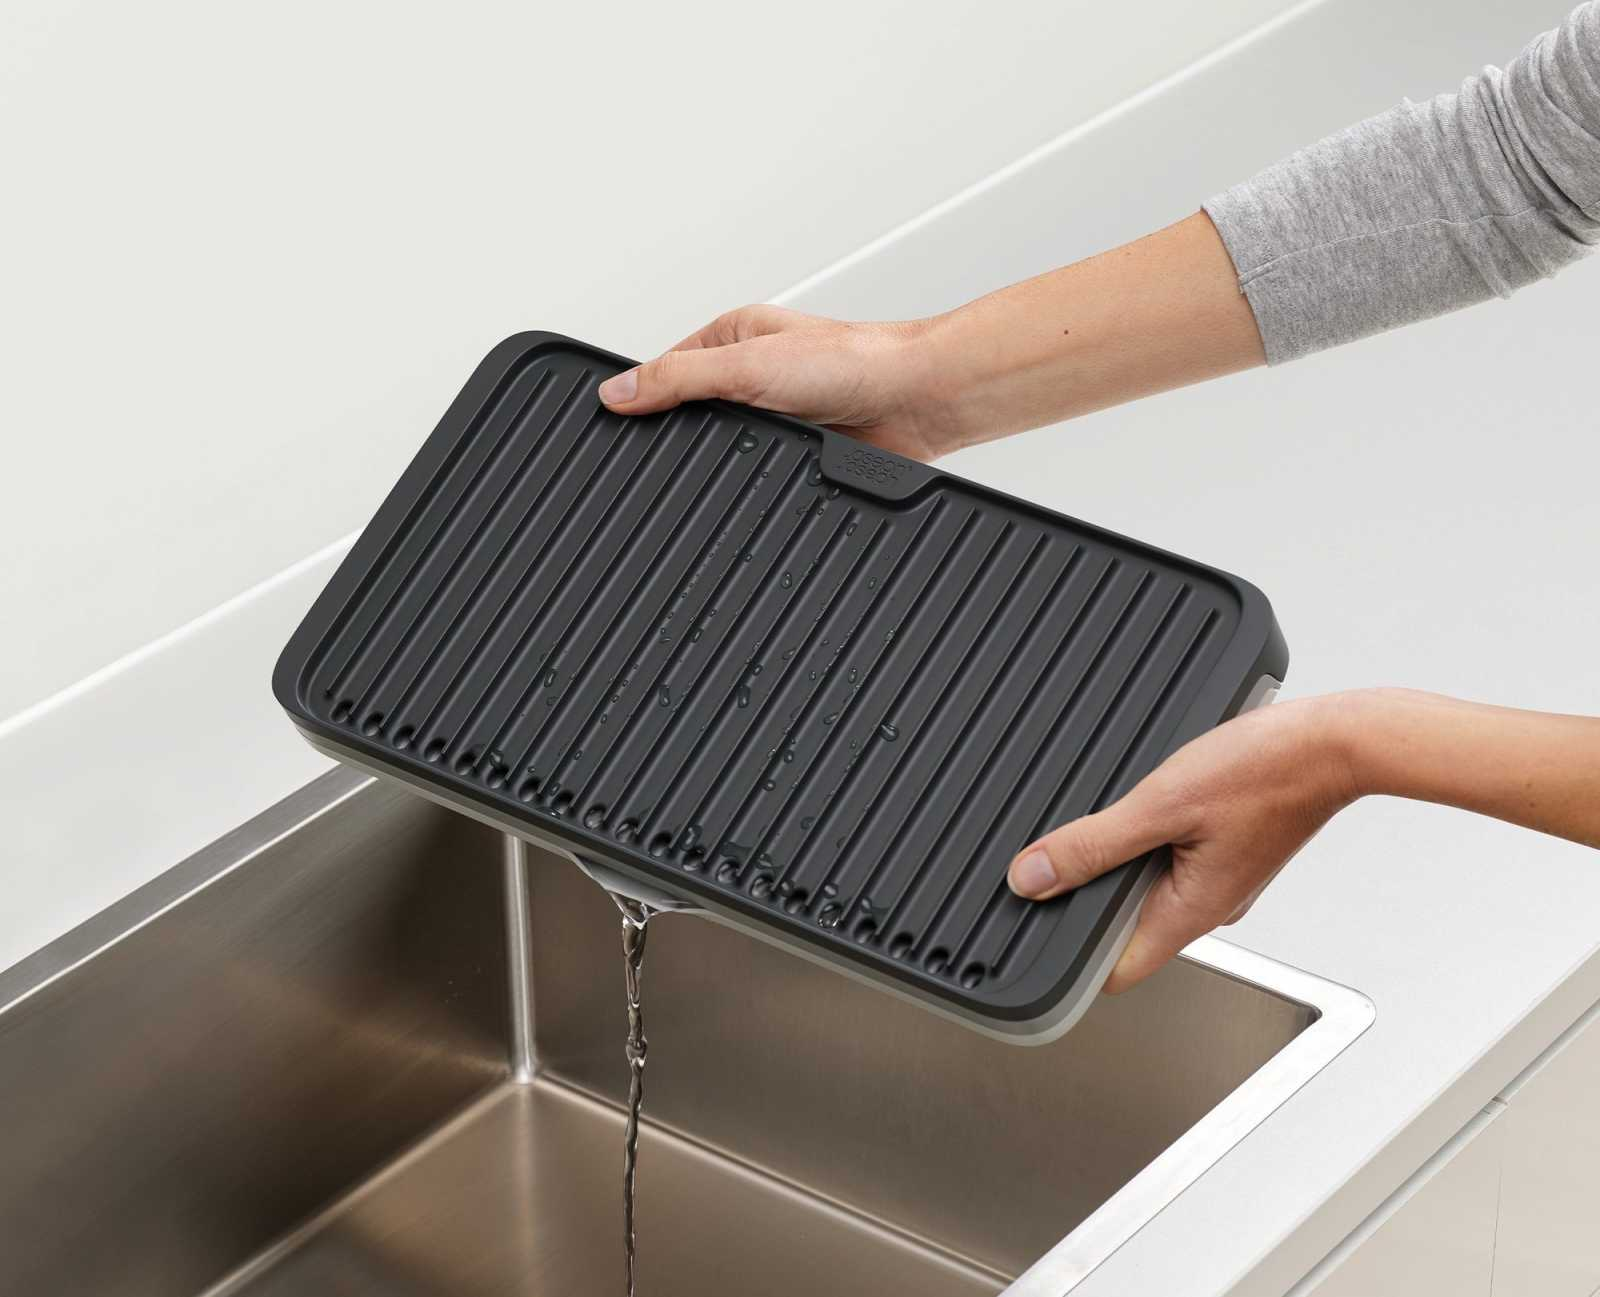 Коврик для сушки посуды раскладной Joseph Joseph Tier™, серый Joseph Joseph 85178 фото 2